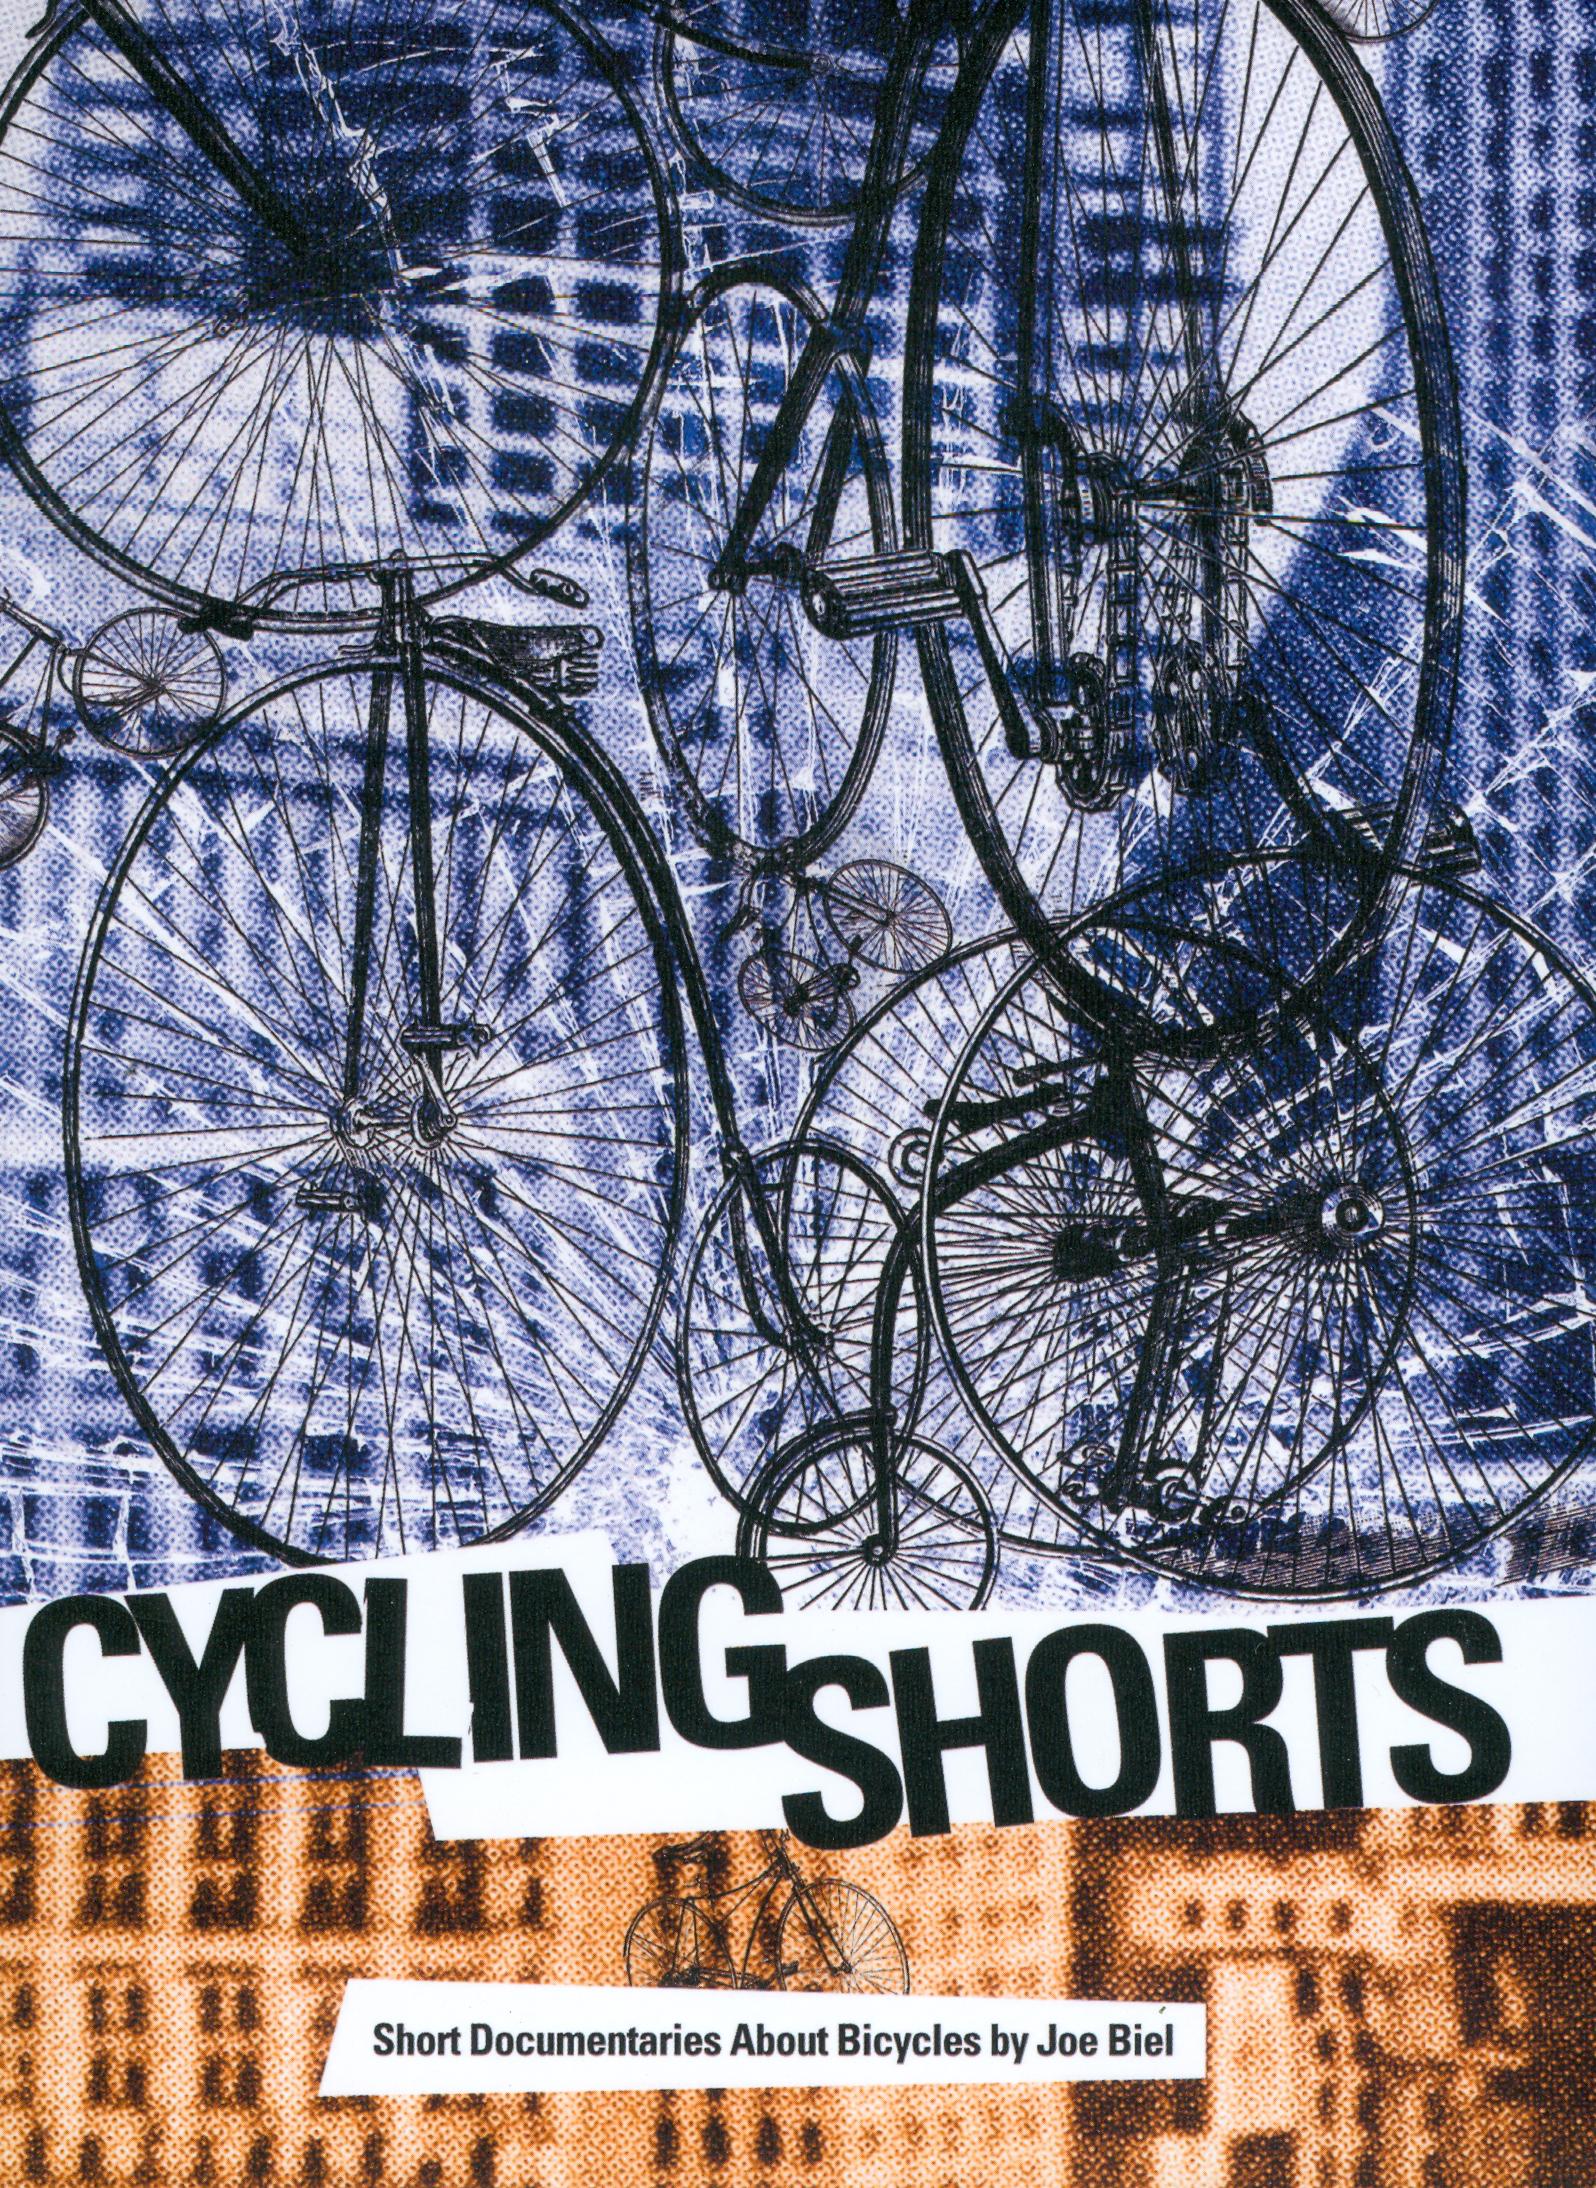 Joe Biel: Cycling Shorts - Short Documentaries About Bicycles